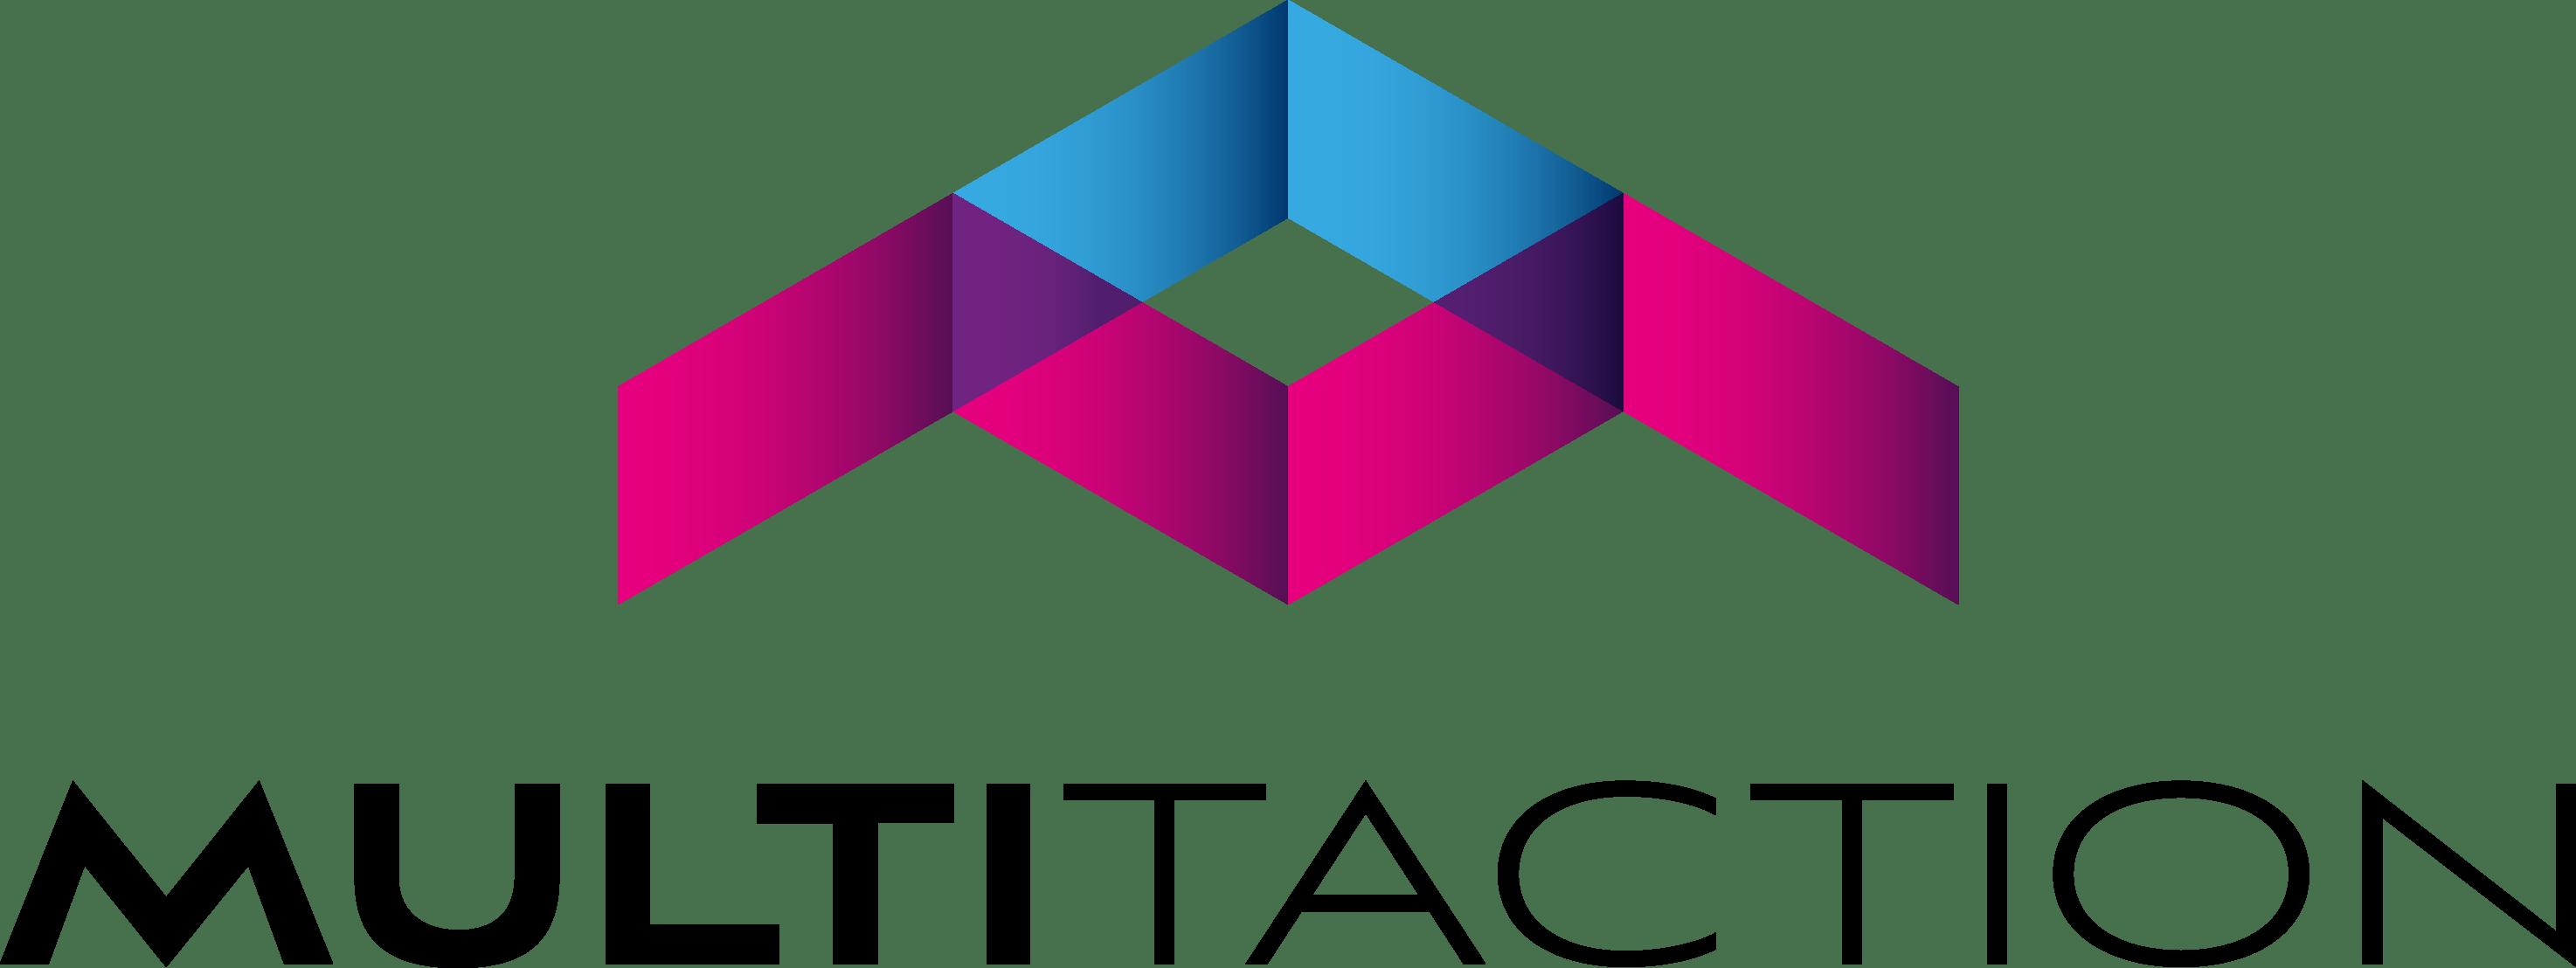 multitaction-logo